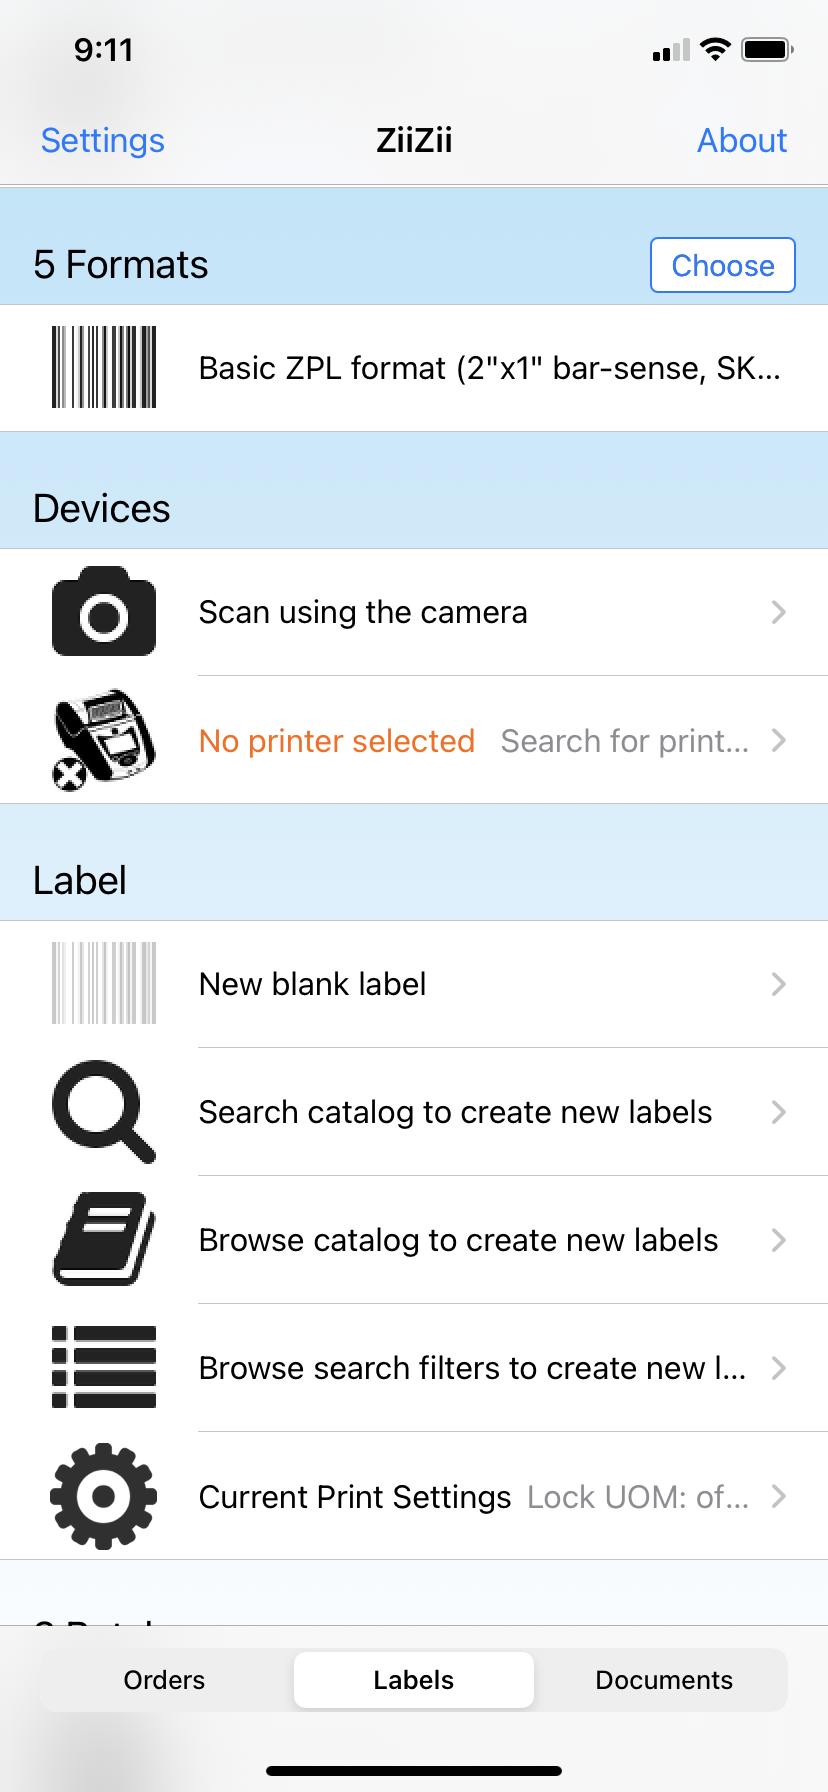 ZiiZii Label Printing